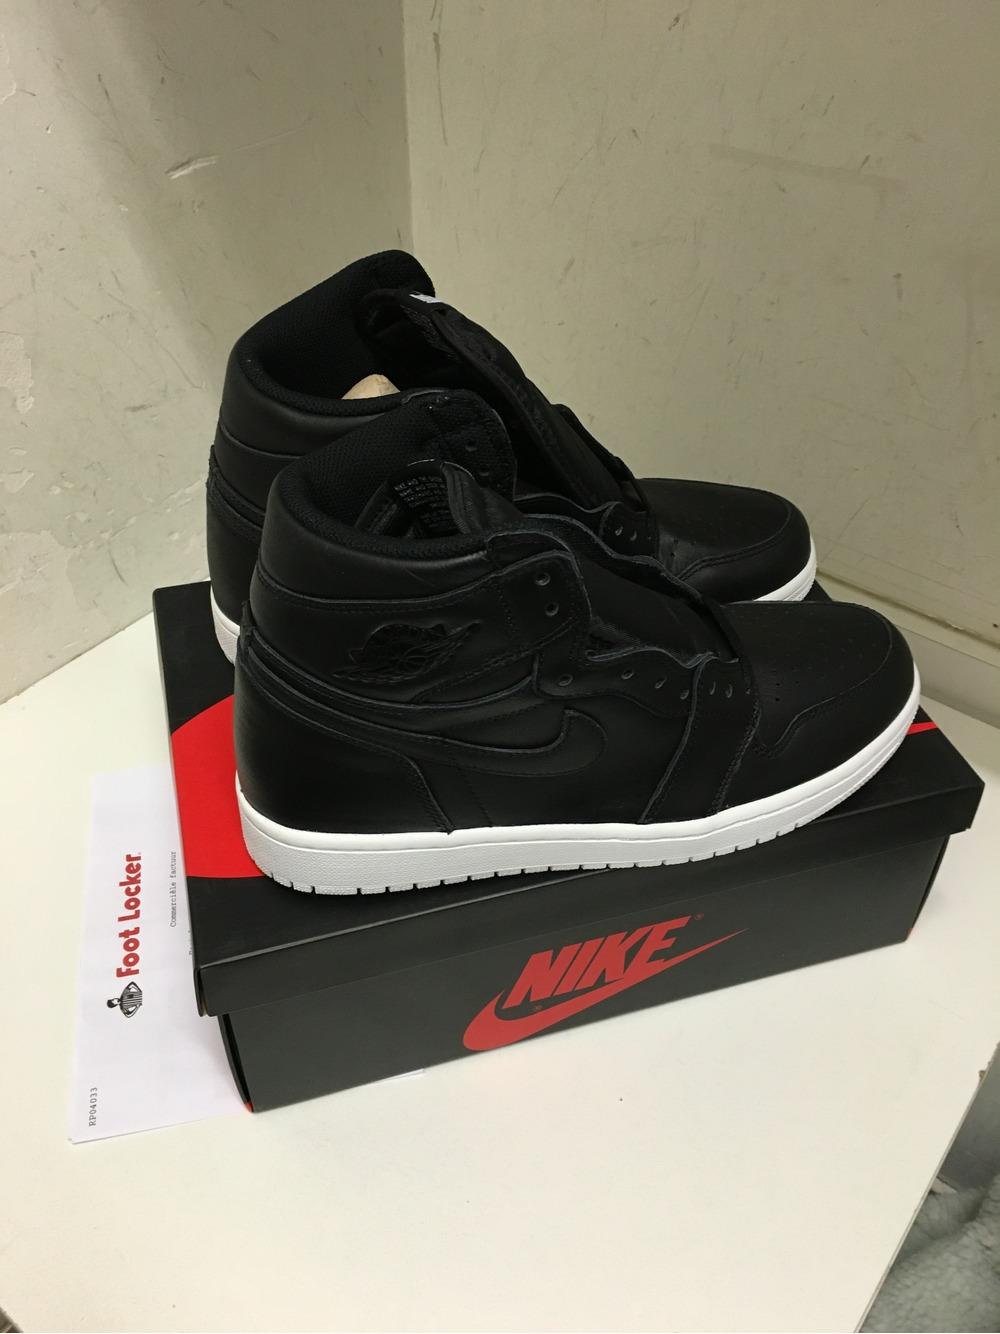 wmns nike shox précise - Air Jordan Nike Air Jordan 1 Retro High OG Cyber Monday Retro High ...